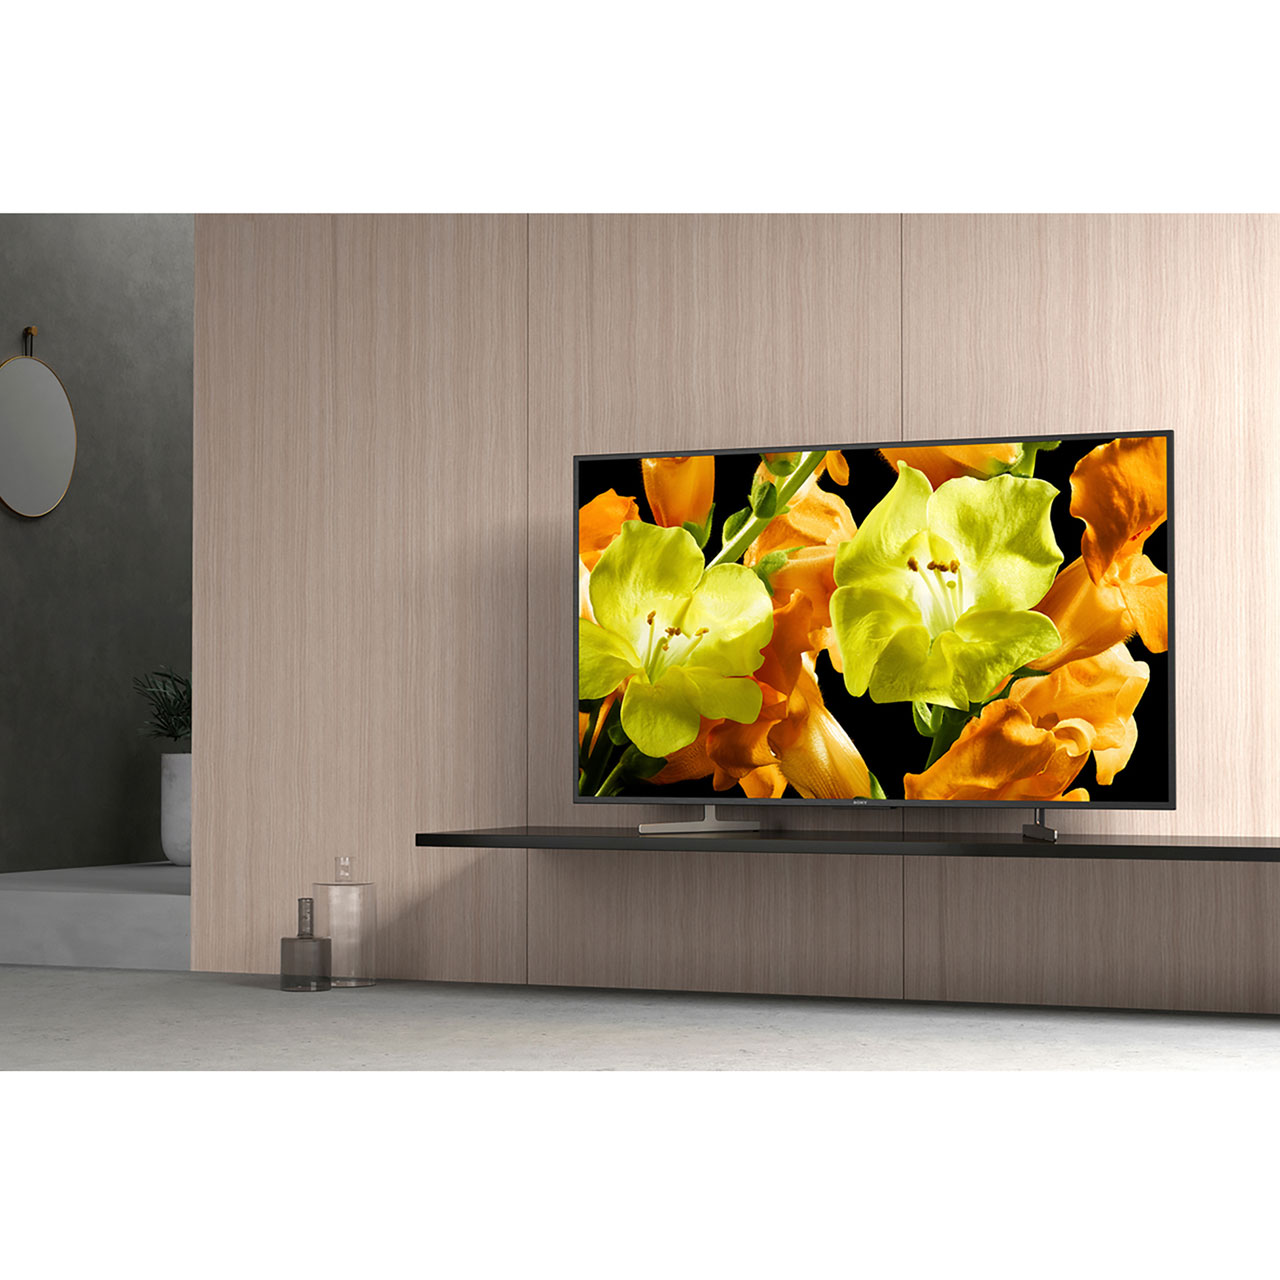 sony bravia 55 inch led tv manual